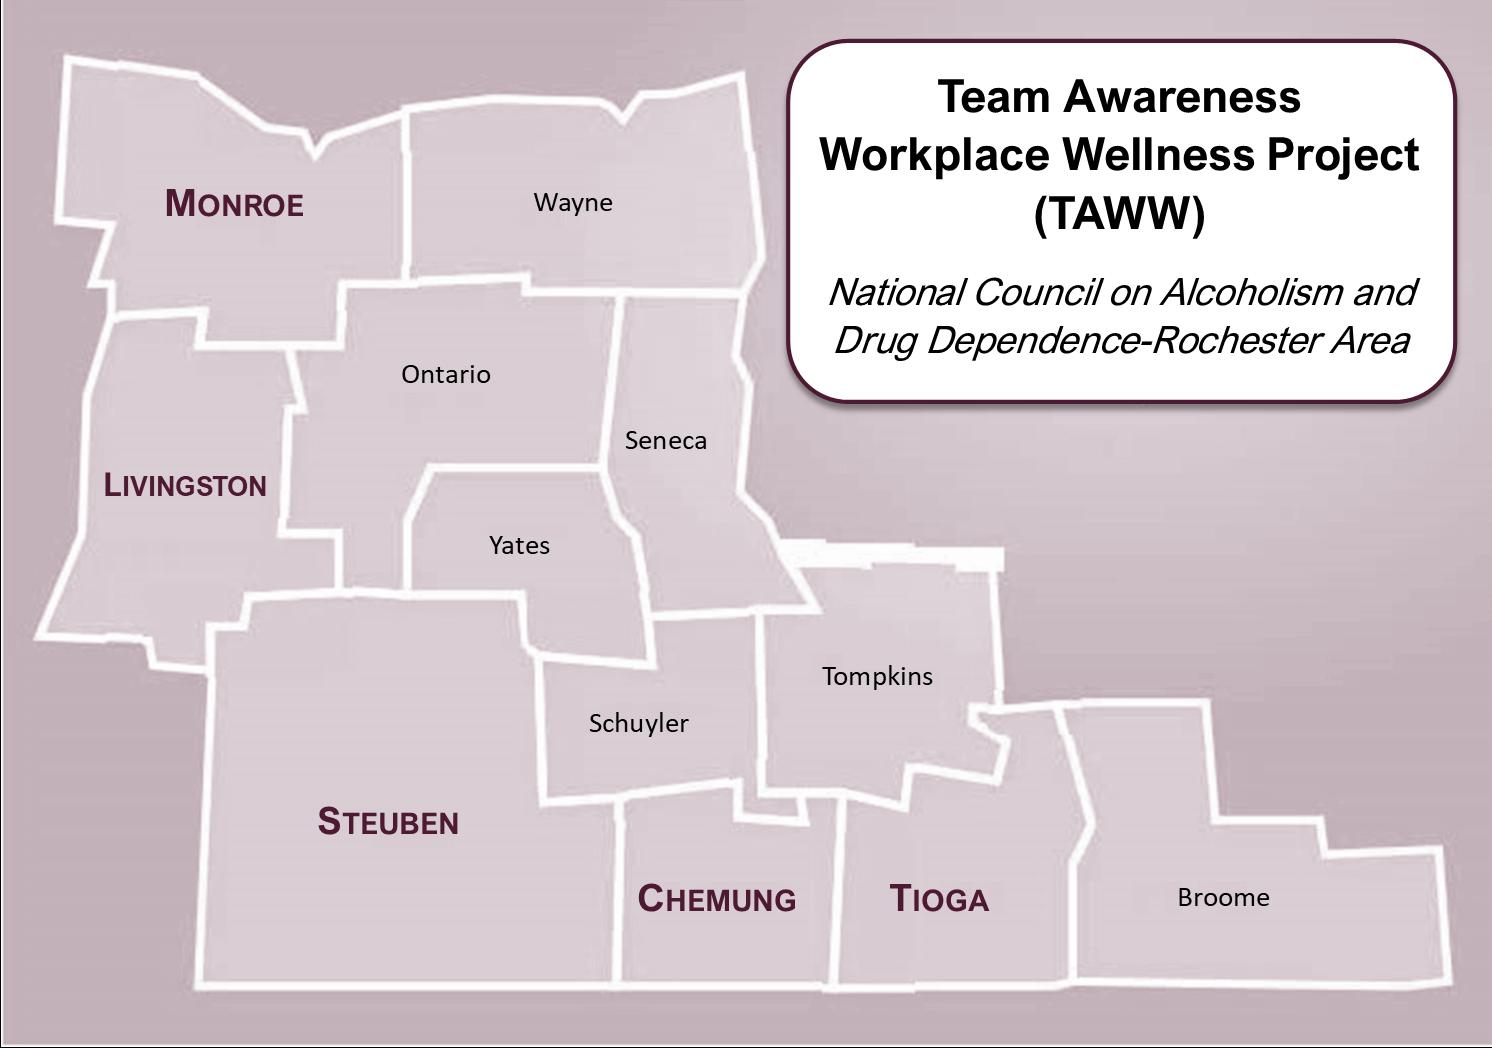 Team Awareness Workplace Wellness Project Map